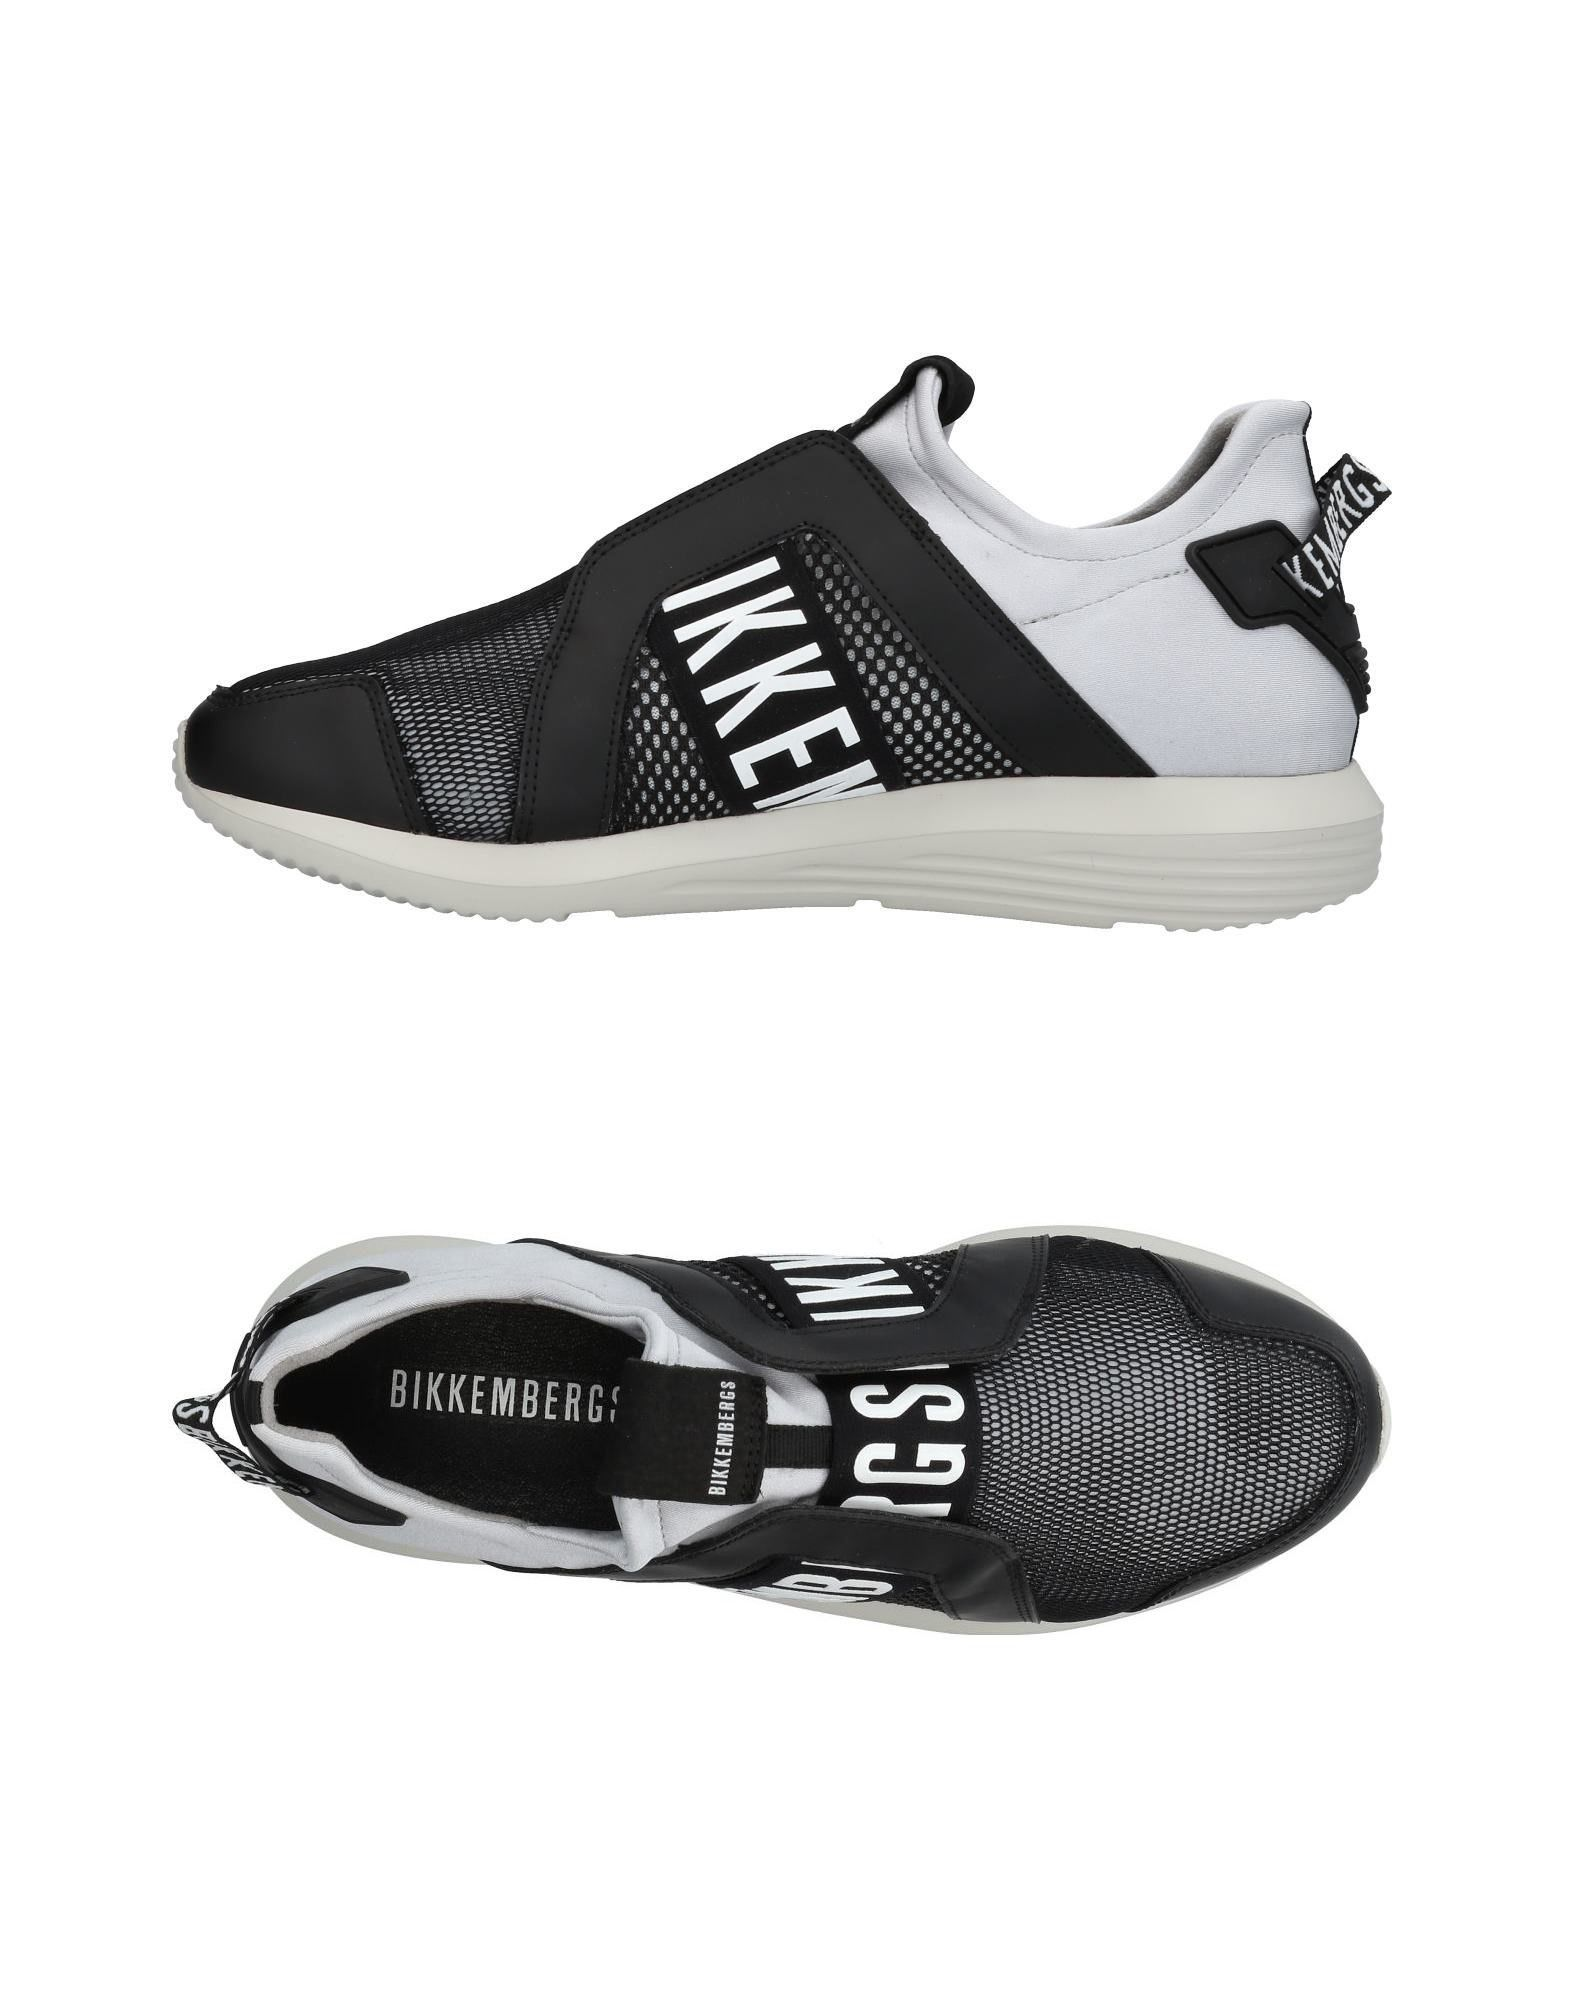 Bikkembergs Sneakers Herren  11417893VD Gute Qualität beliebte Schuhe